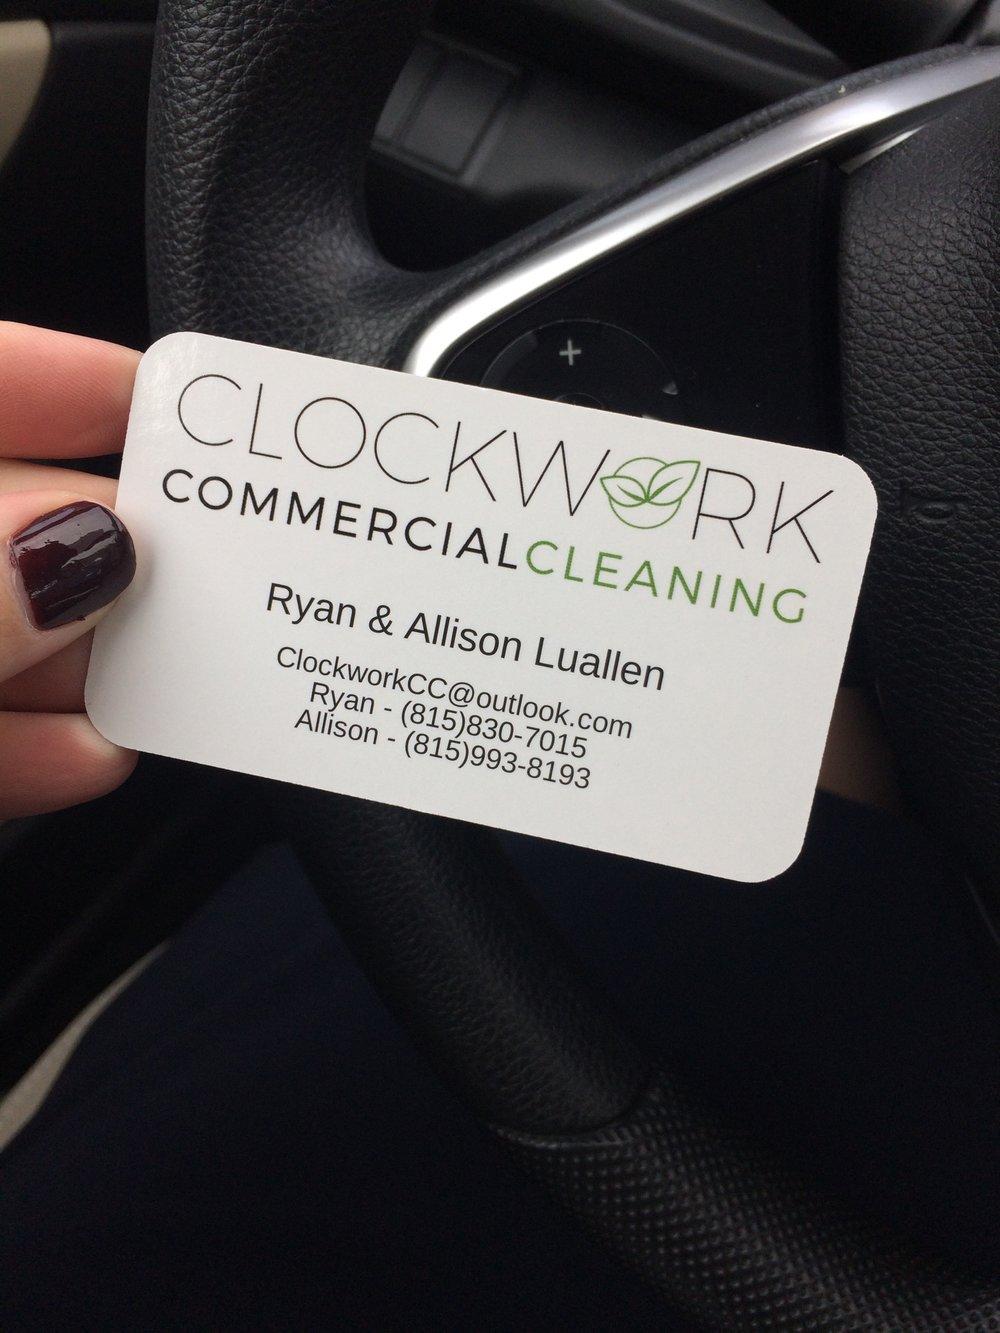 Clockwork Commercial Cleaning | Business Card | BelaMarca Studio